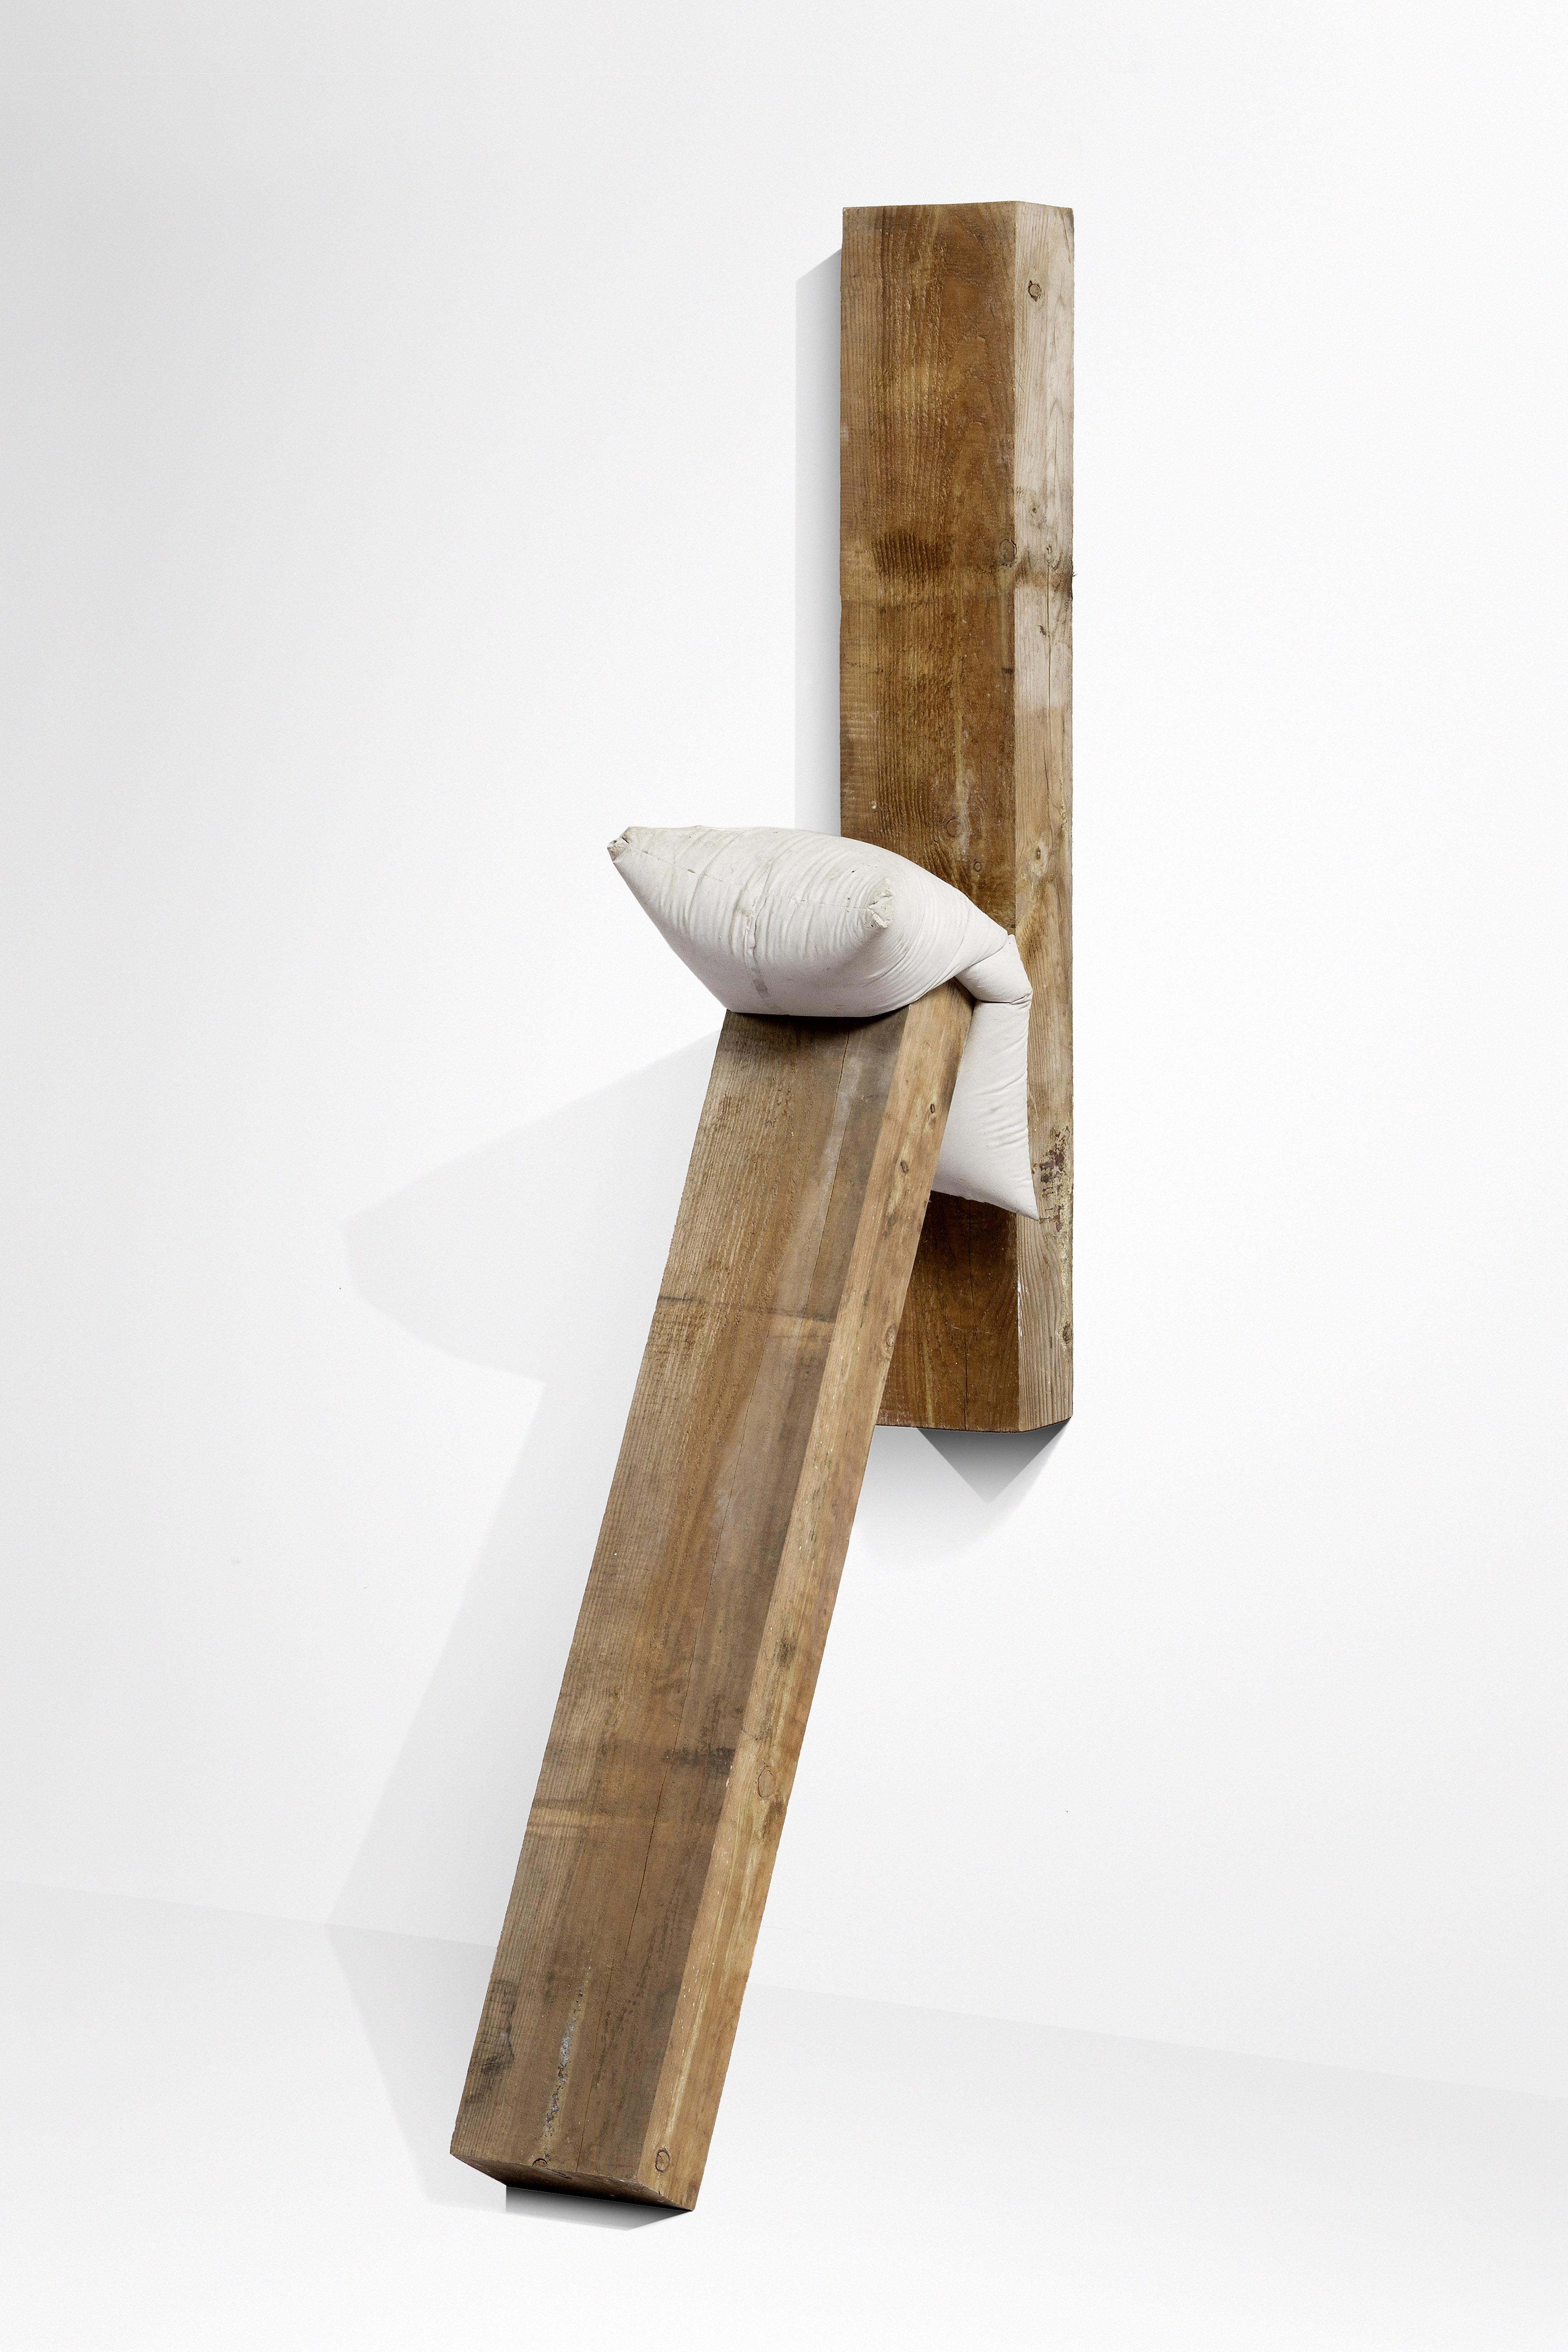 2 beams - 2012 Courtesy Bodson Gallery